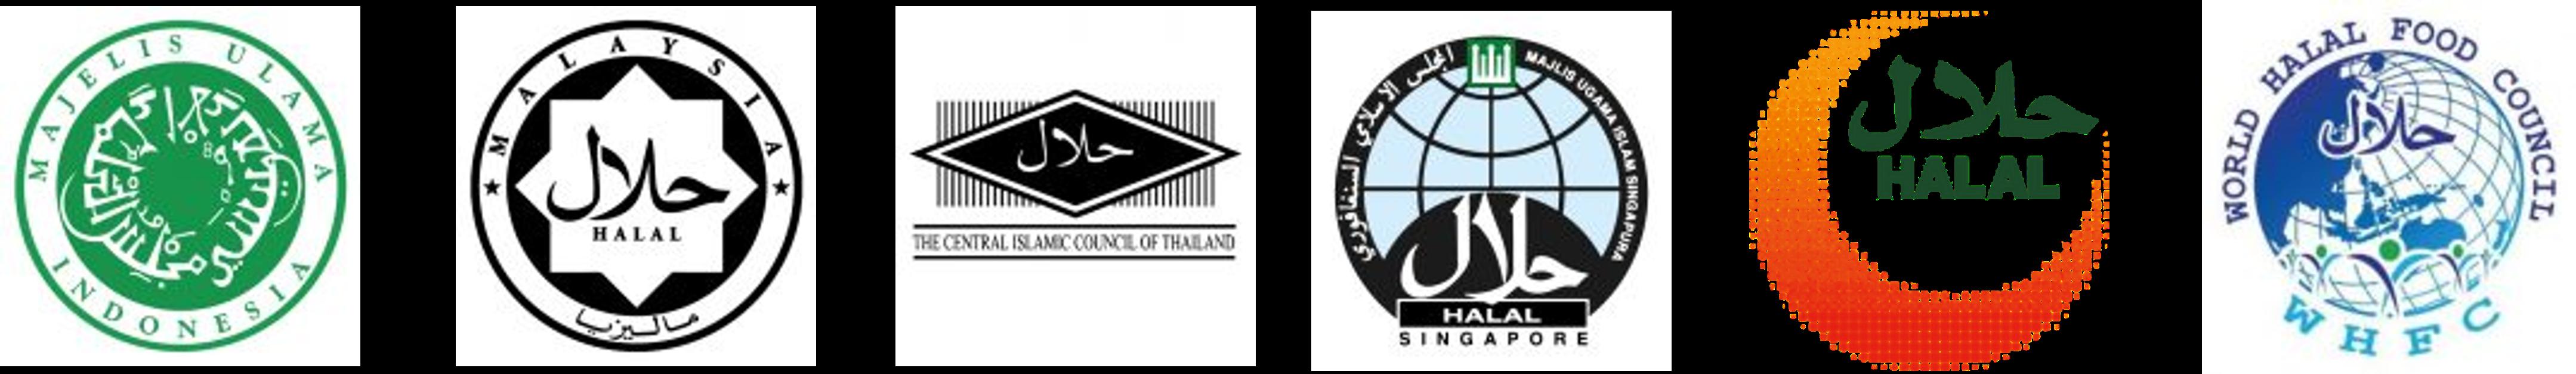 Halal Certifications